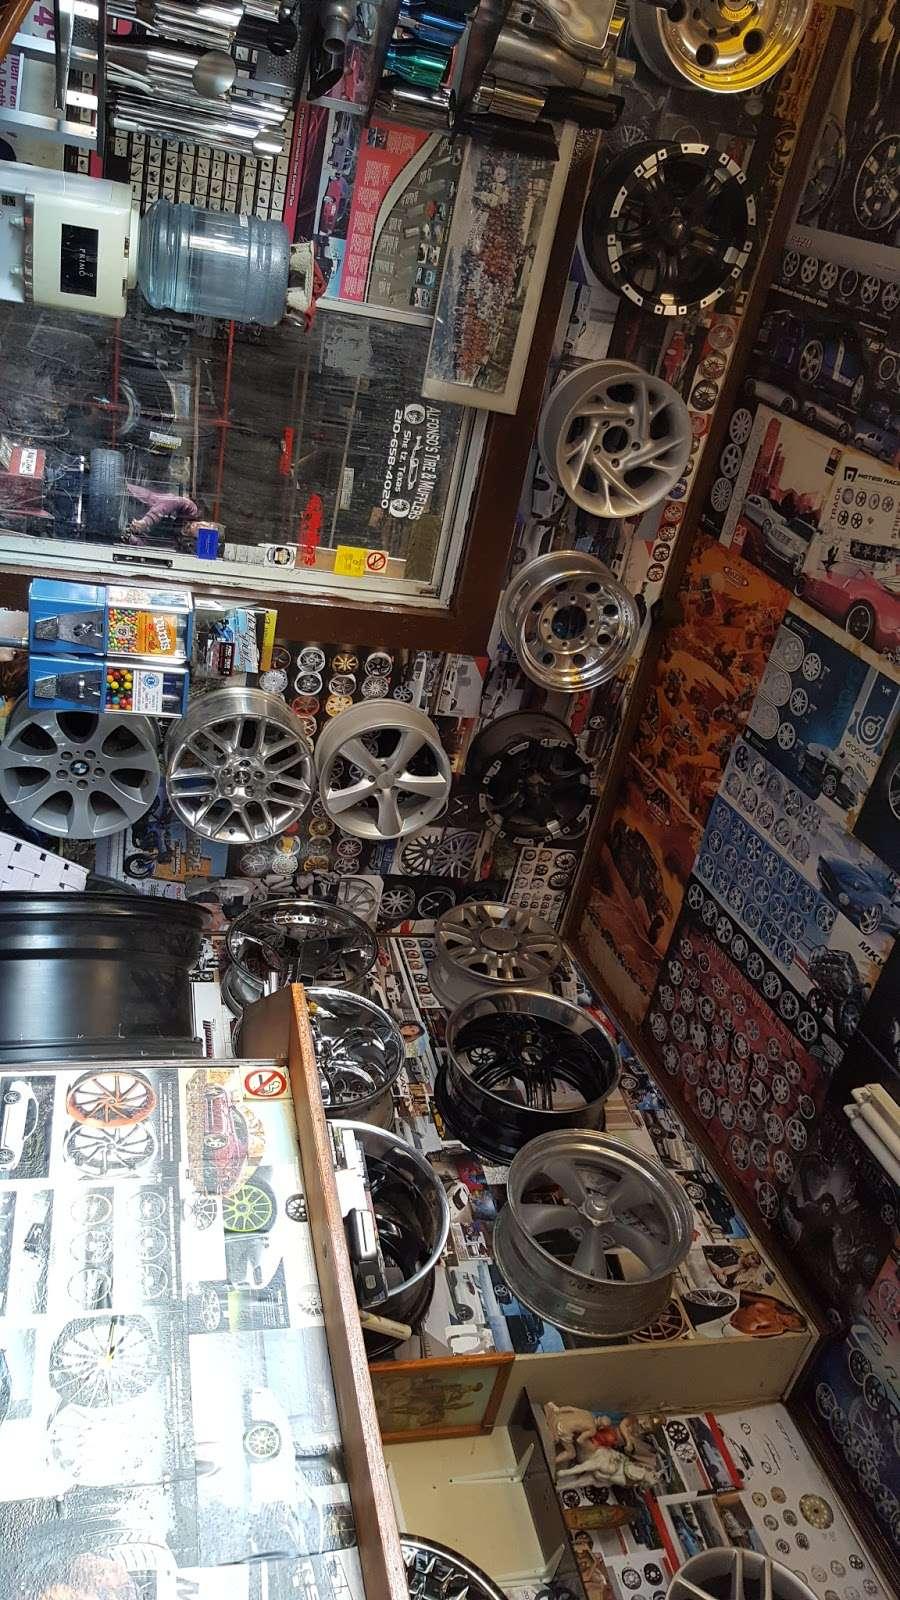 Alfonsos Tire & Wheels - car repair  | Photo 2 of 10 | Address: 432 Main St, Schertz, TX 78154, USA | Phone: (210) 658-4020